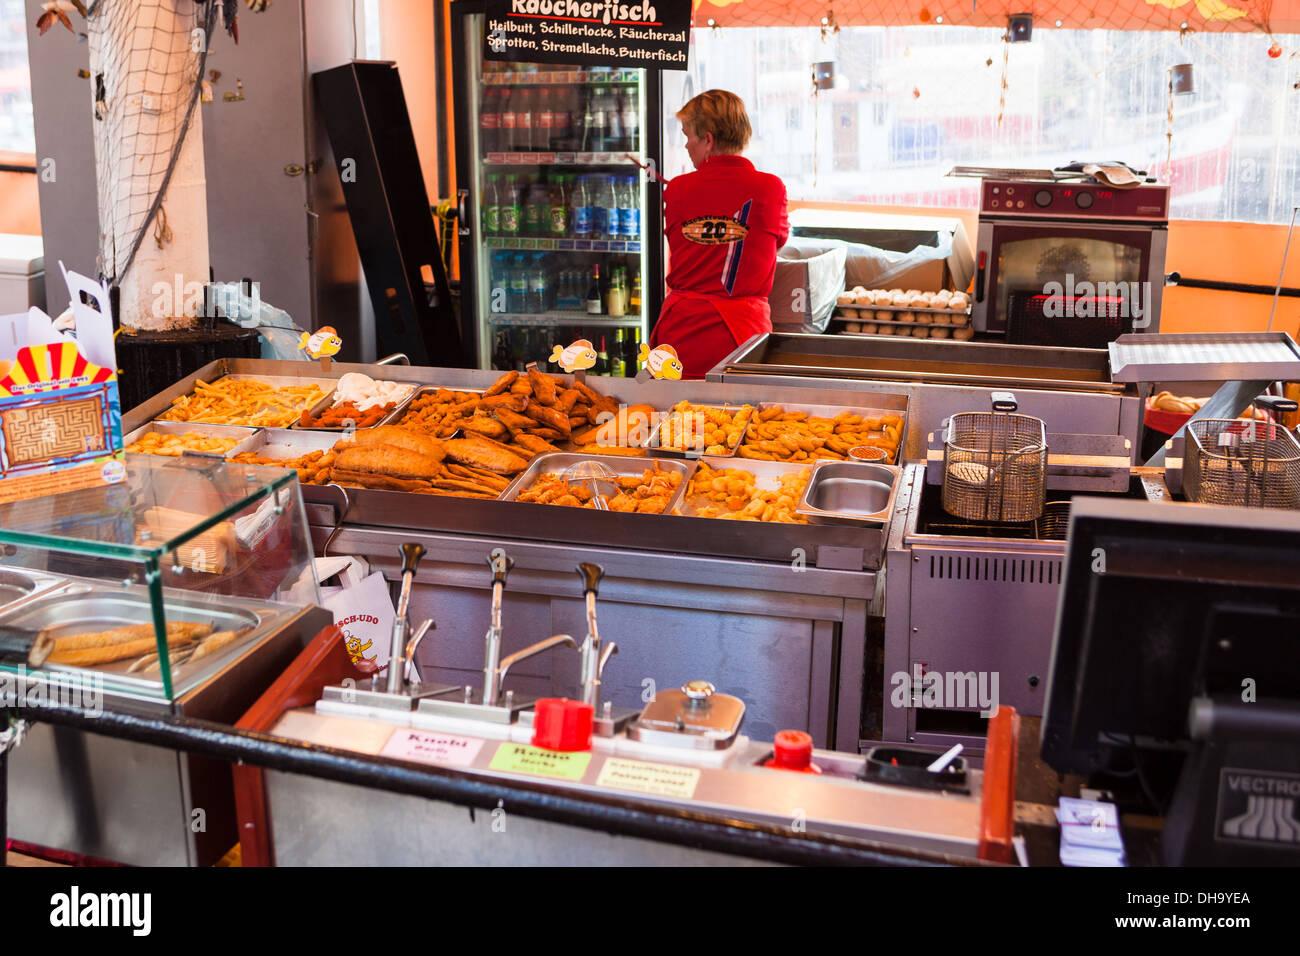 fish and chips shop on riverside boat warnemunde rostock germany stock photo royalty free. Black Bedroom Furniture Sets. Home Design Ideas